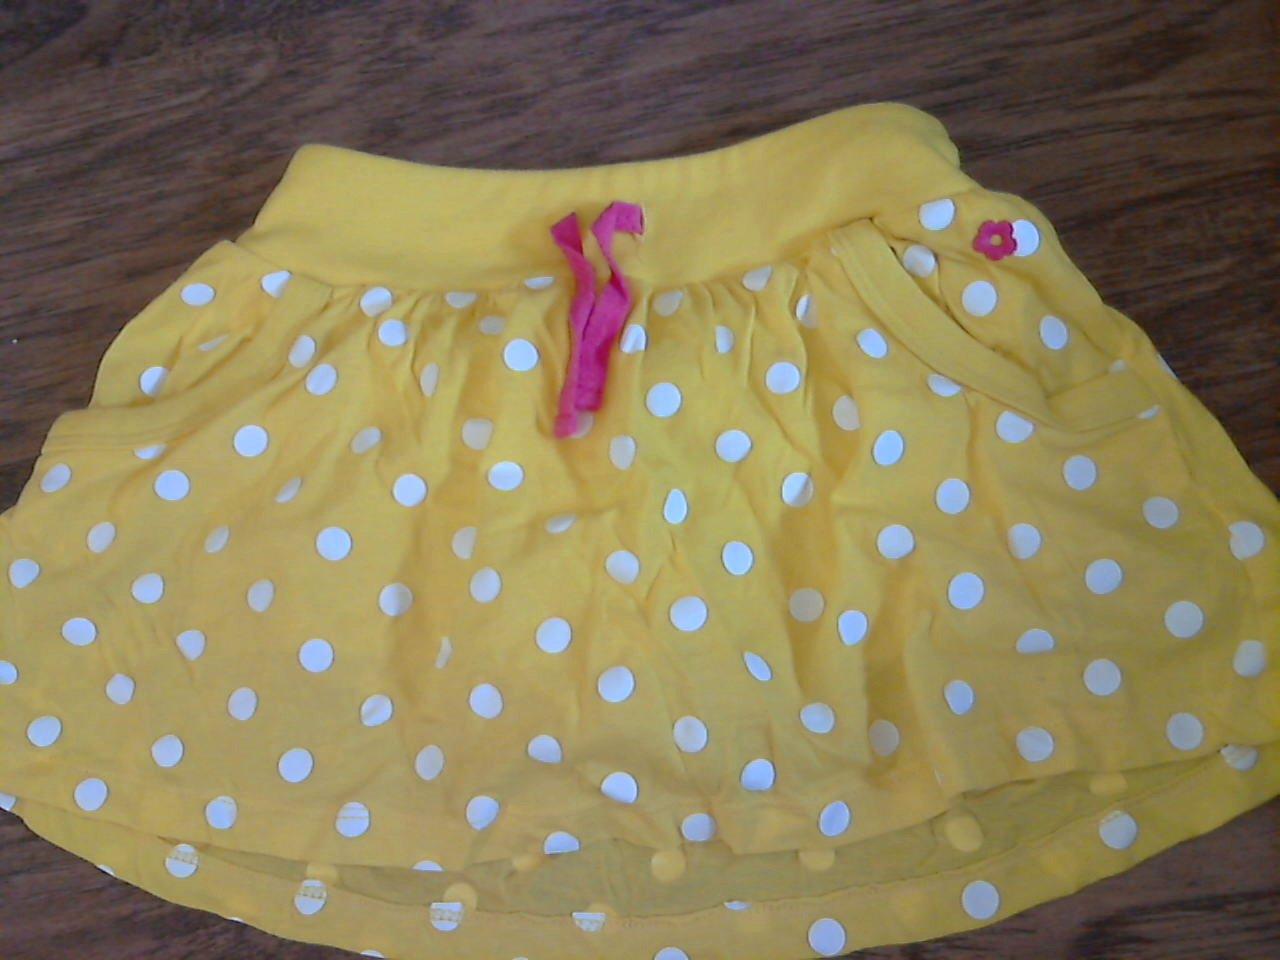 Carter's toddler girl's yellow waistband skirt 4T